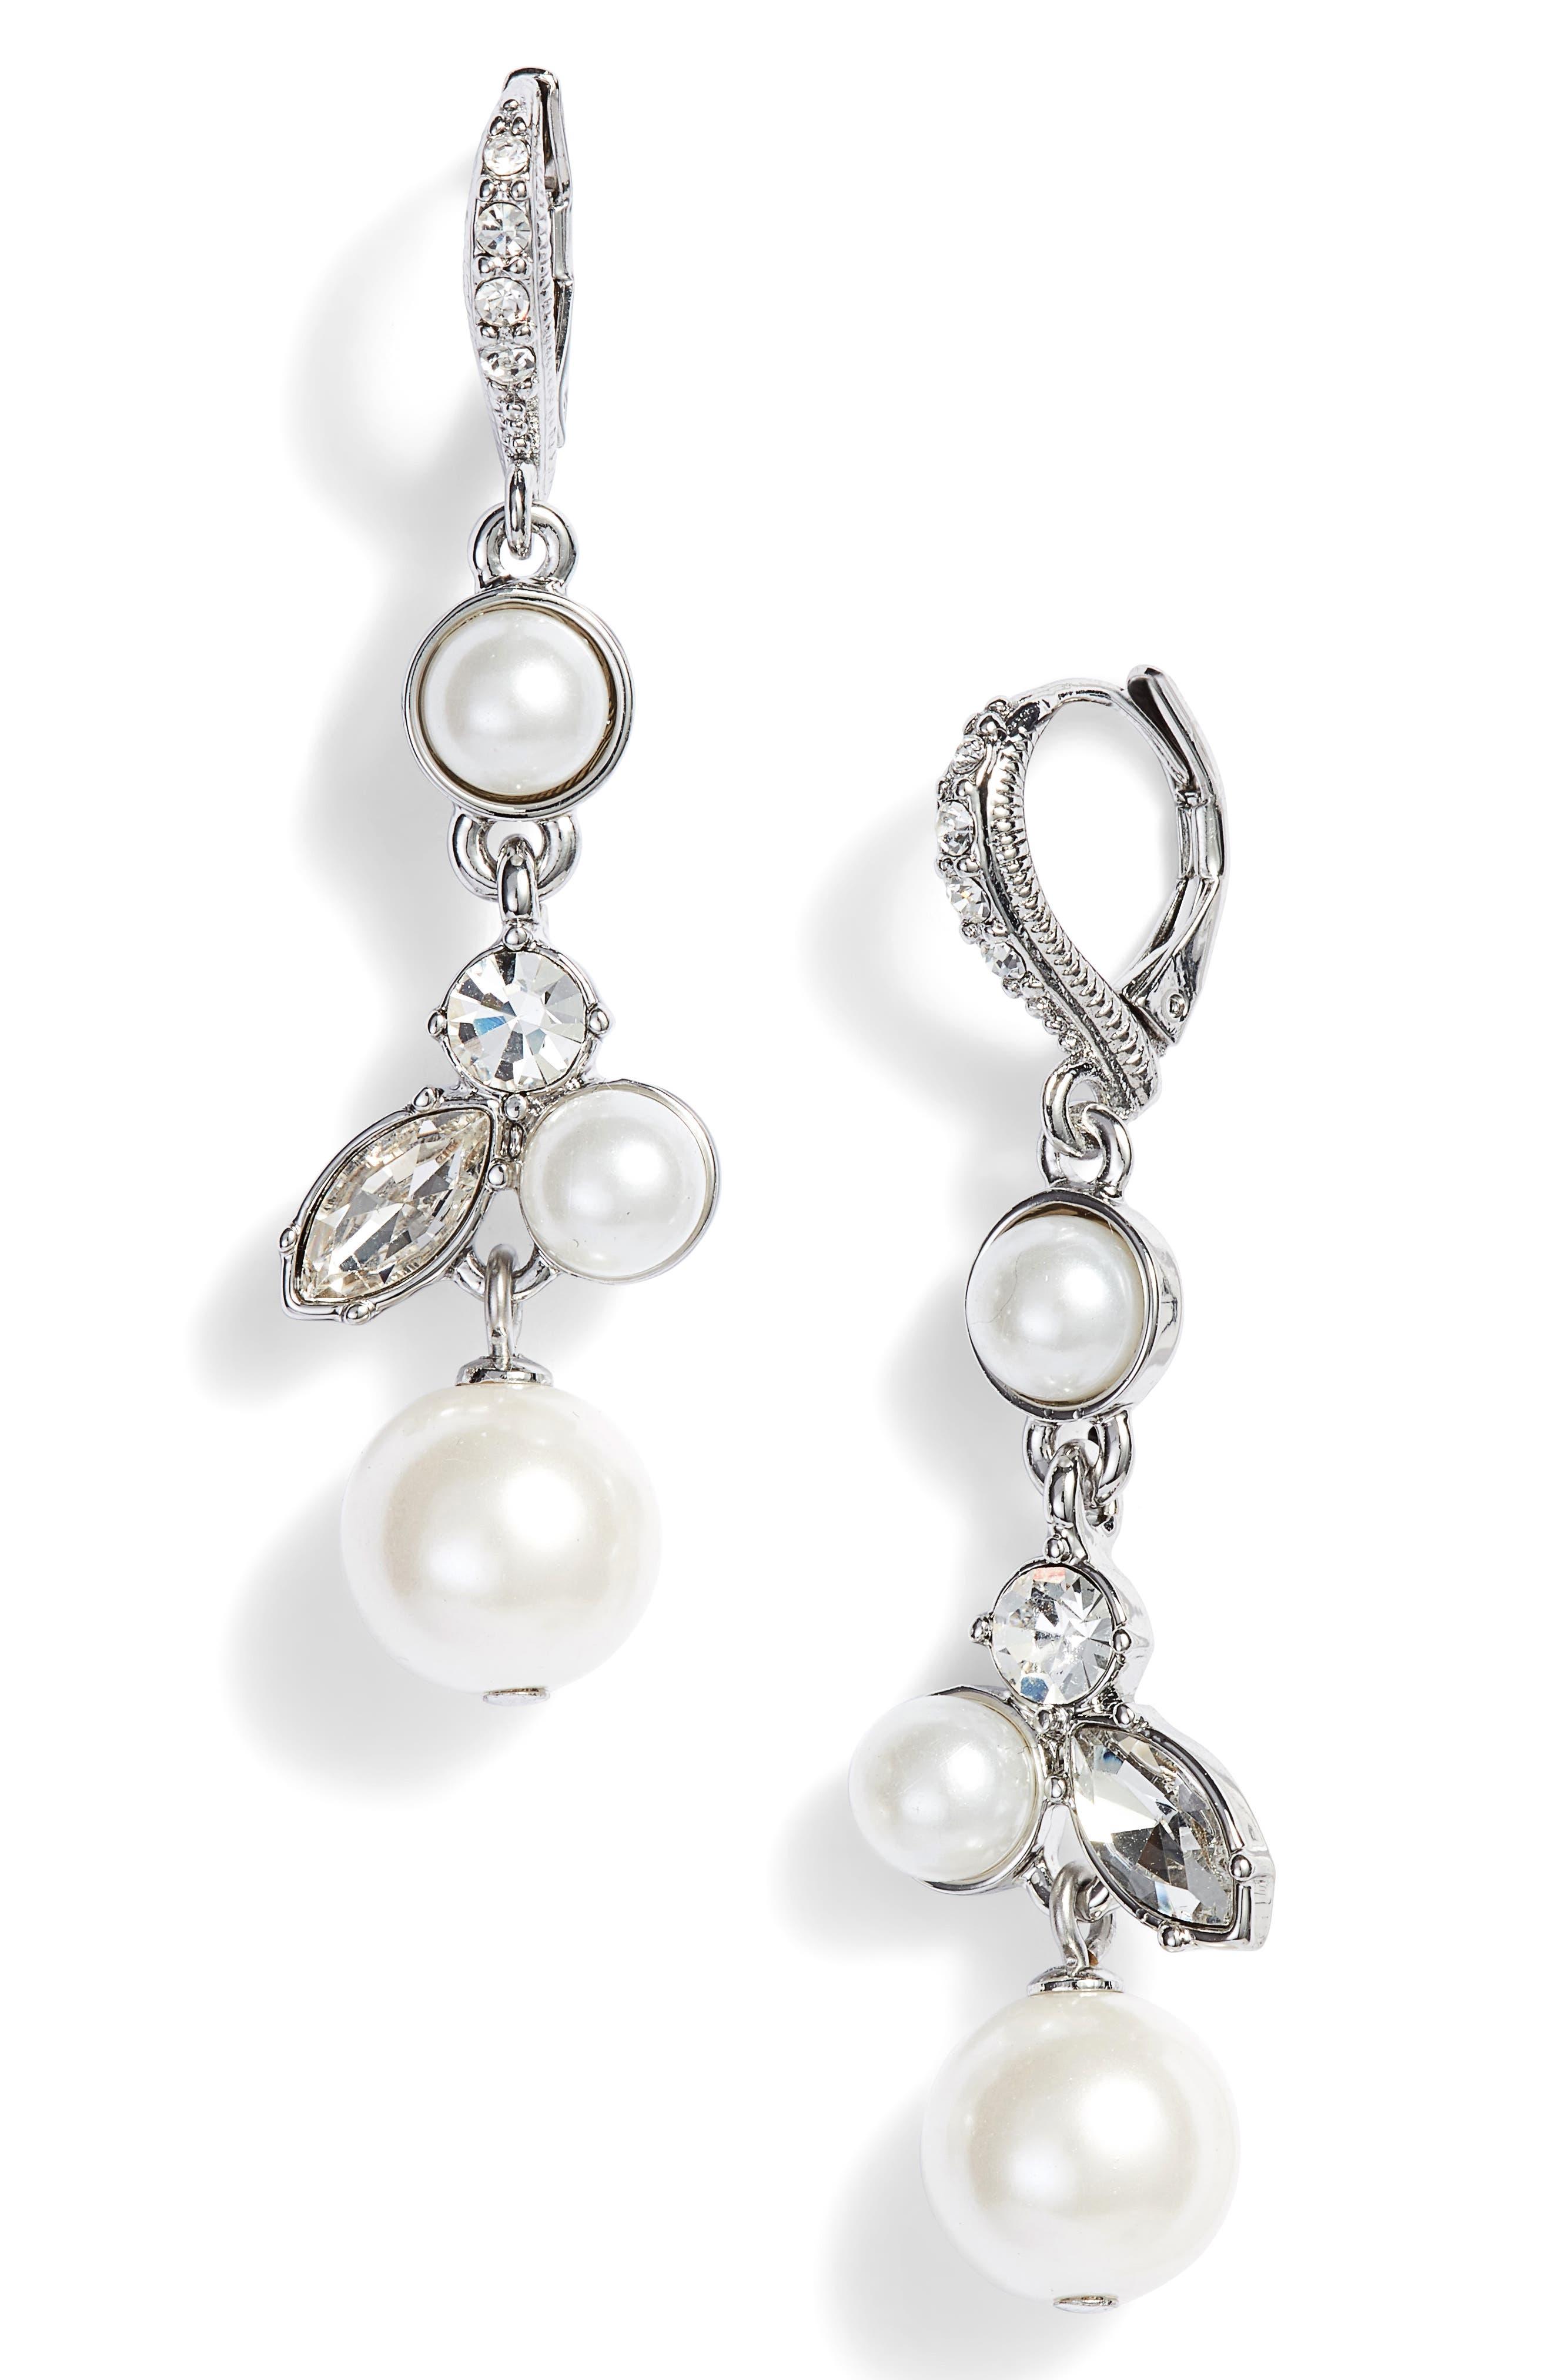 Cluster Drop Earrings,                             Main thumbnail 1, color,                             040